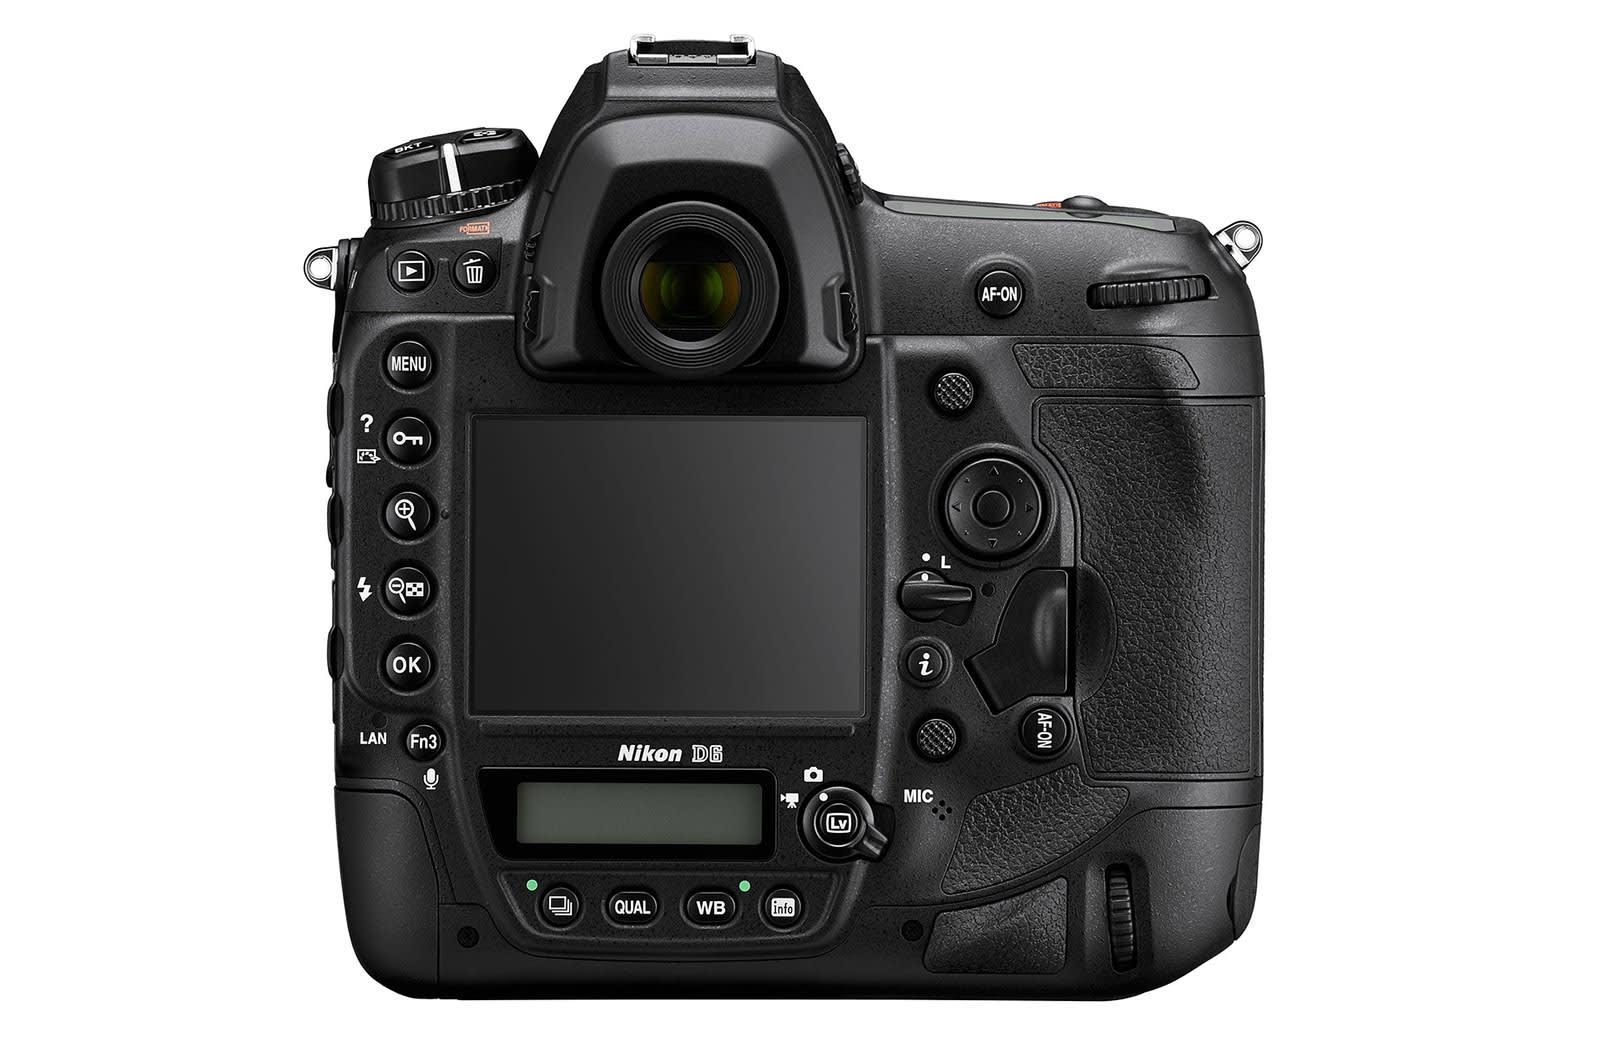 Nikon D6 professional full-frame FX format DSLR